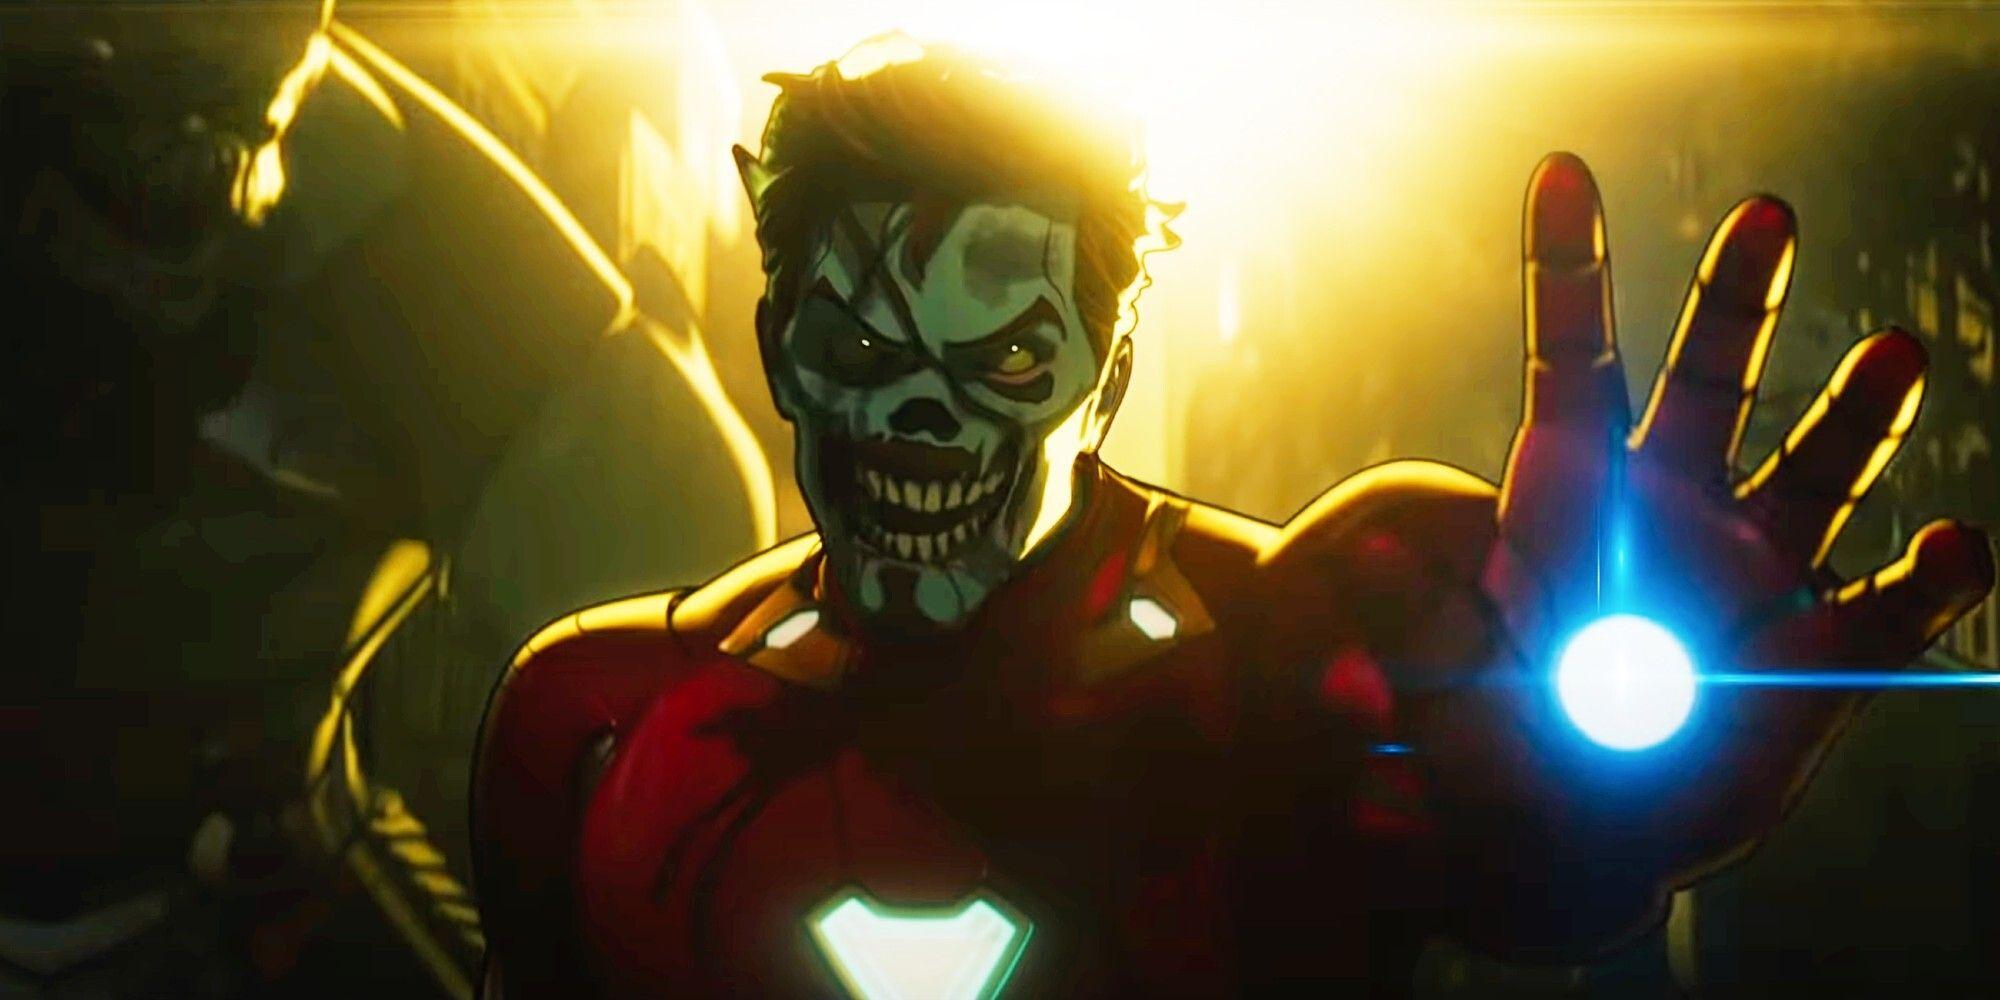 Marvel's What If? Trailer: Iron Man Meets Killmonger & More Alt MCU Timelines